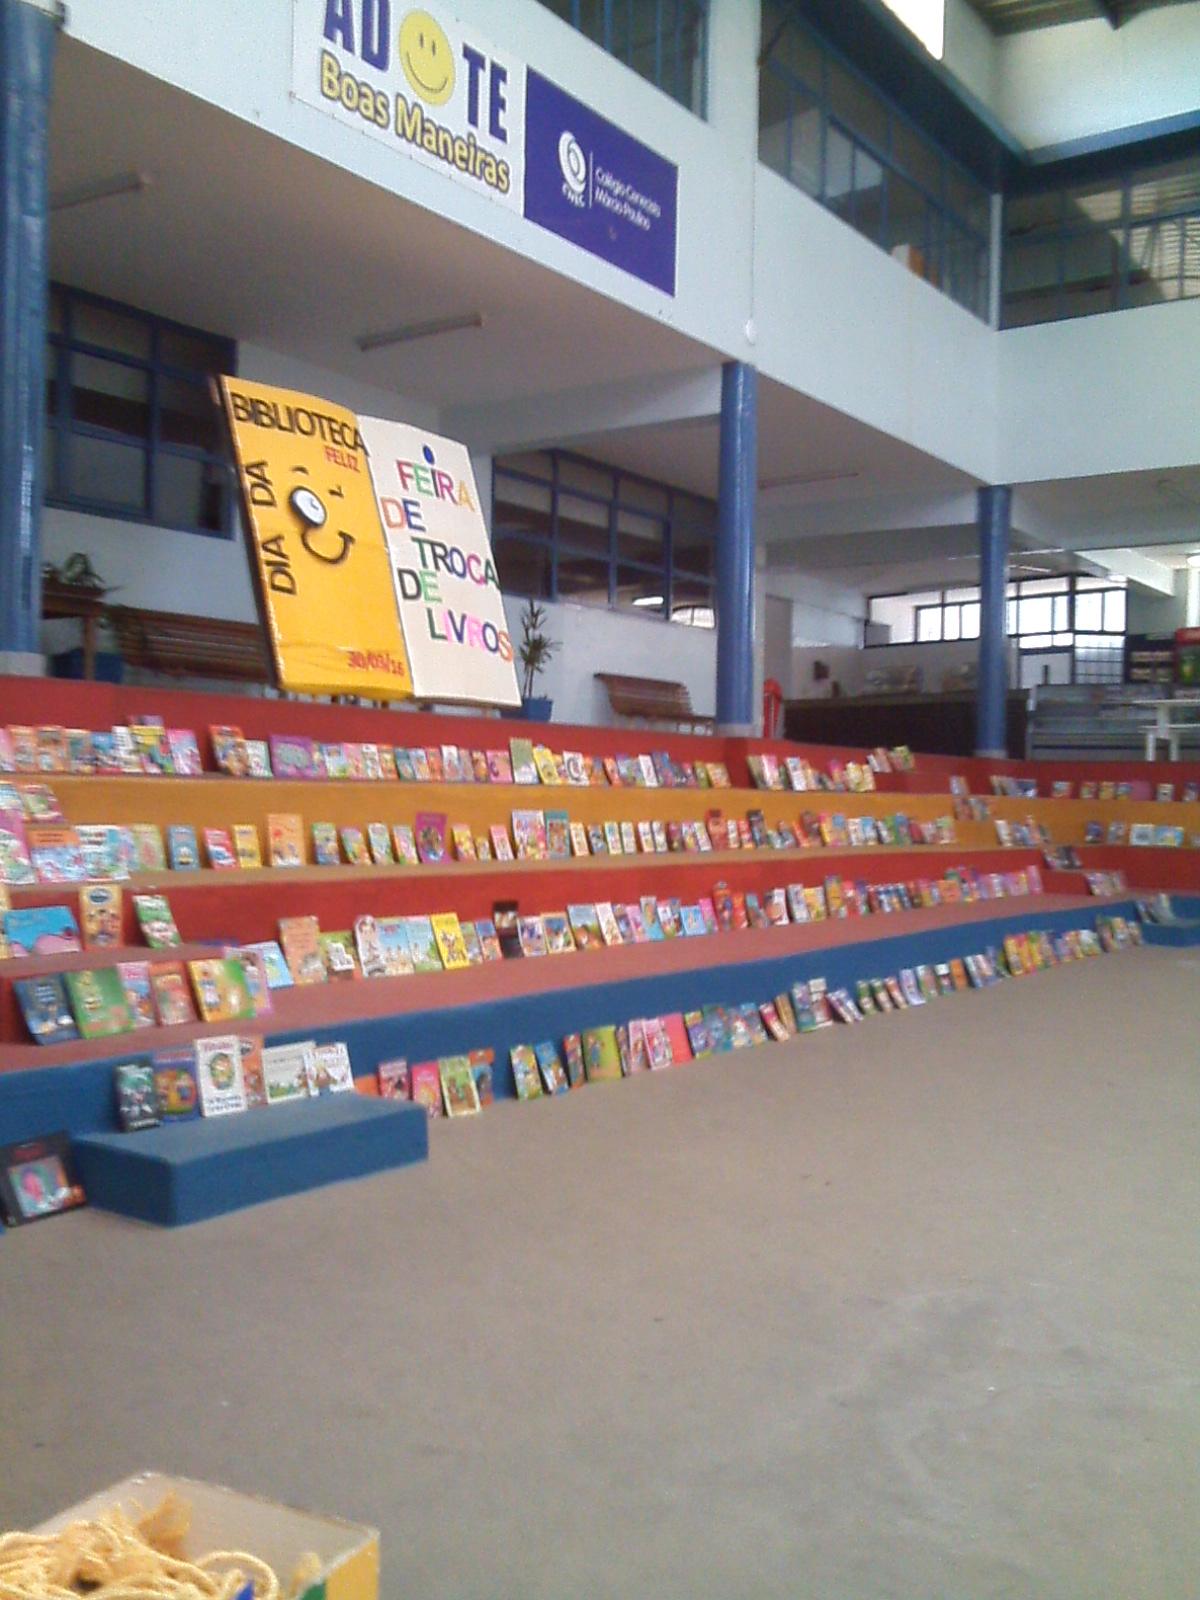 Feira de livros promove a troca de 464 obras entre os alunos (Foto: Vanessa Cipriano)